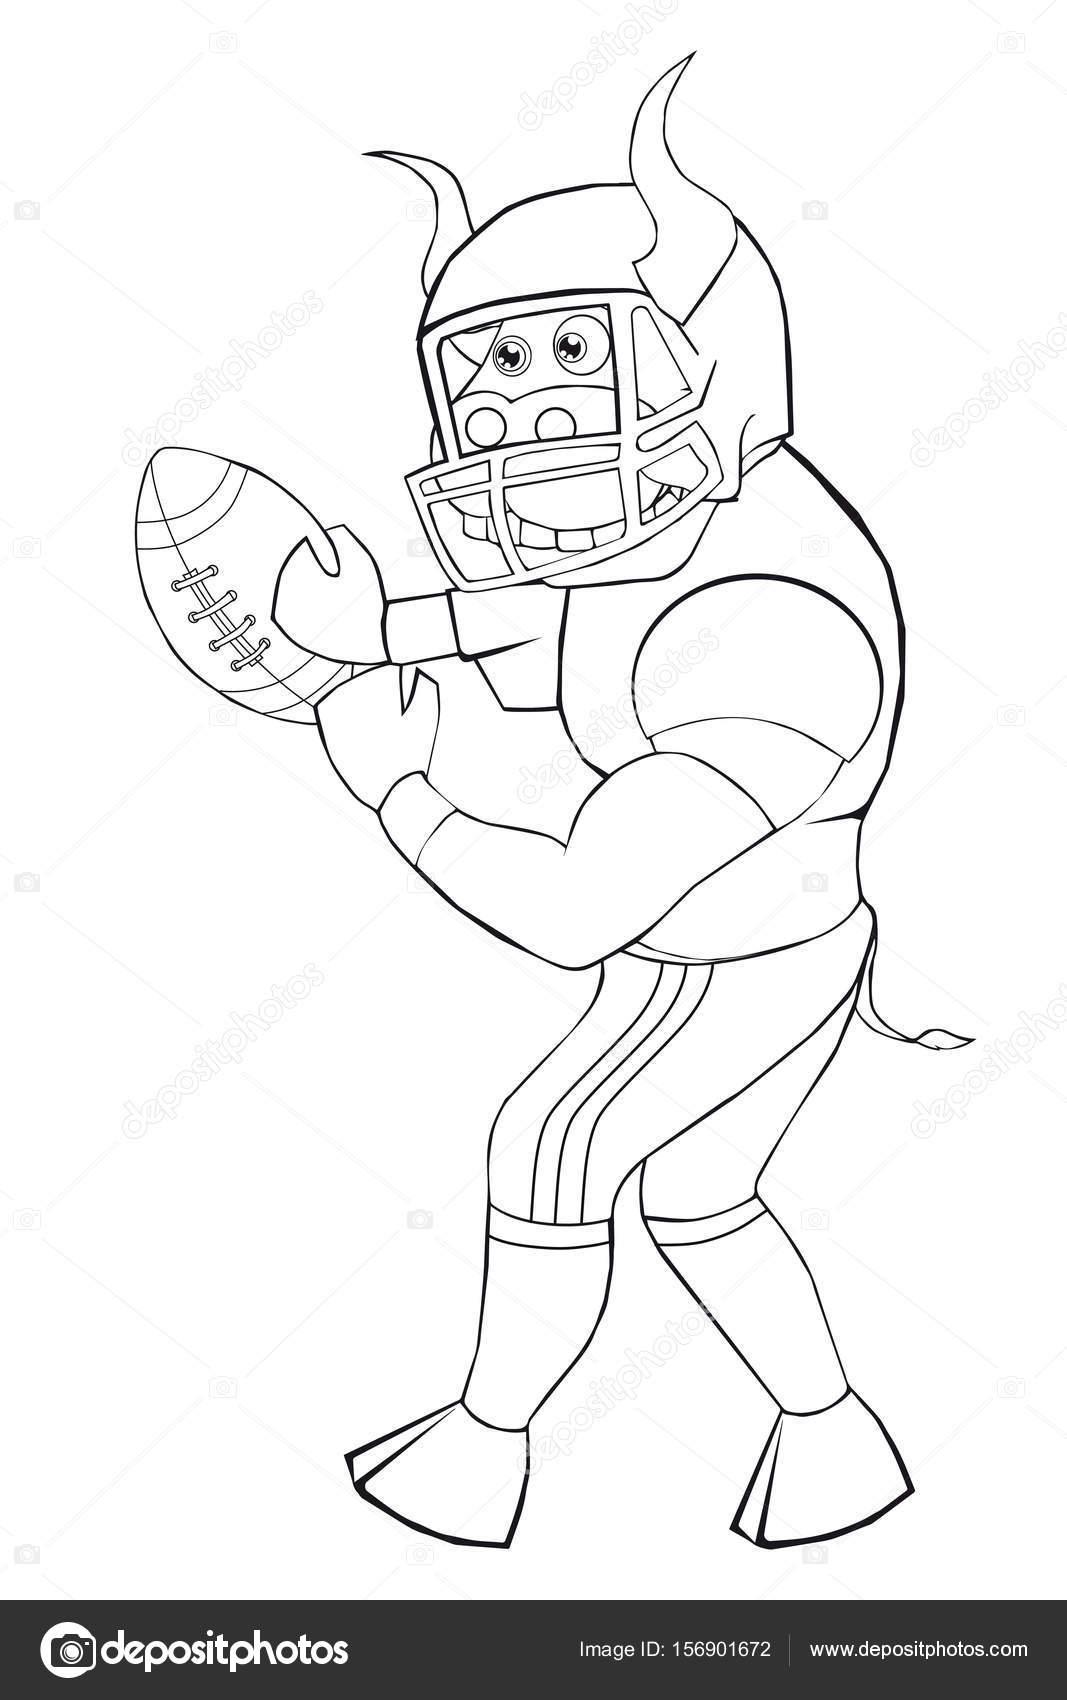 Coloring Book Bull spielt American Football. Cartoon-Stil. Isoliert ...